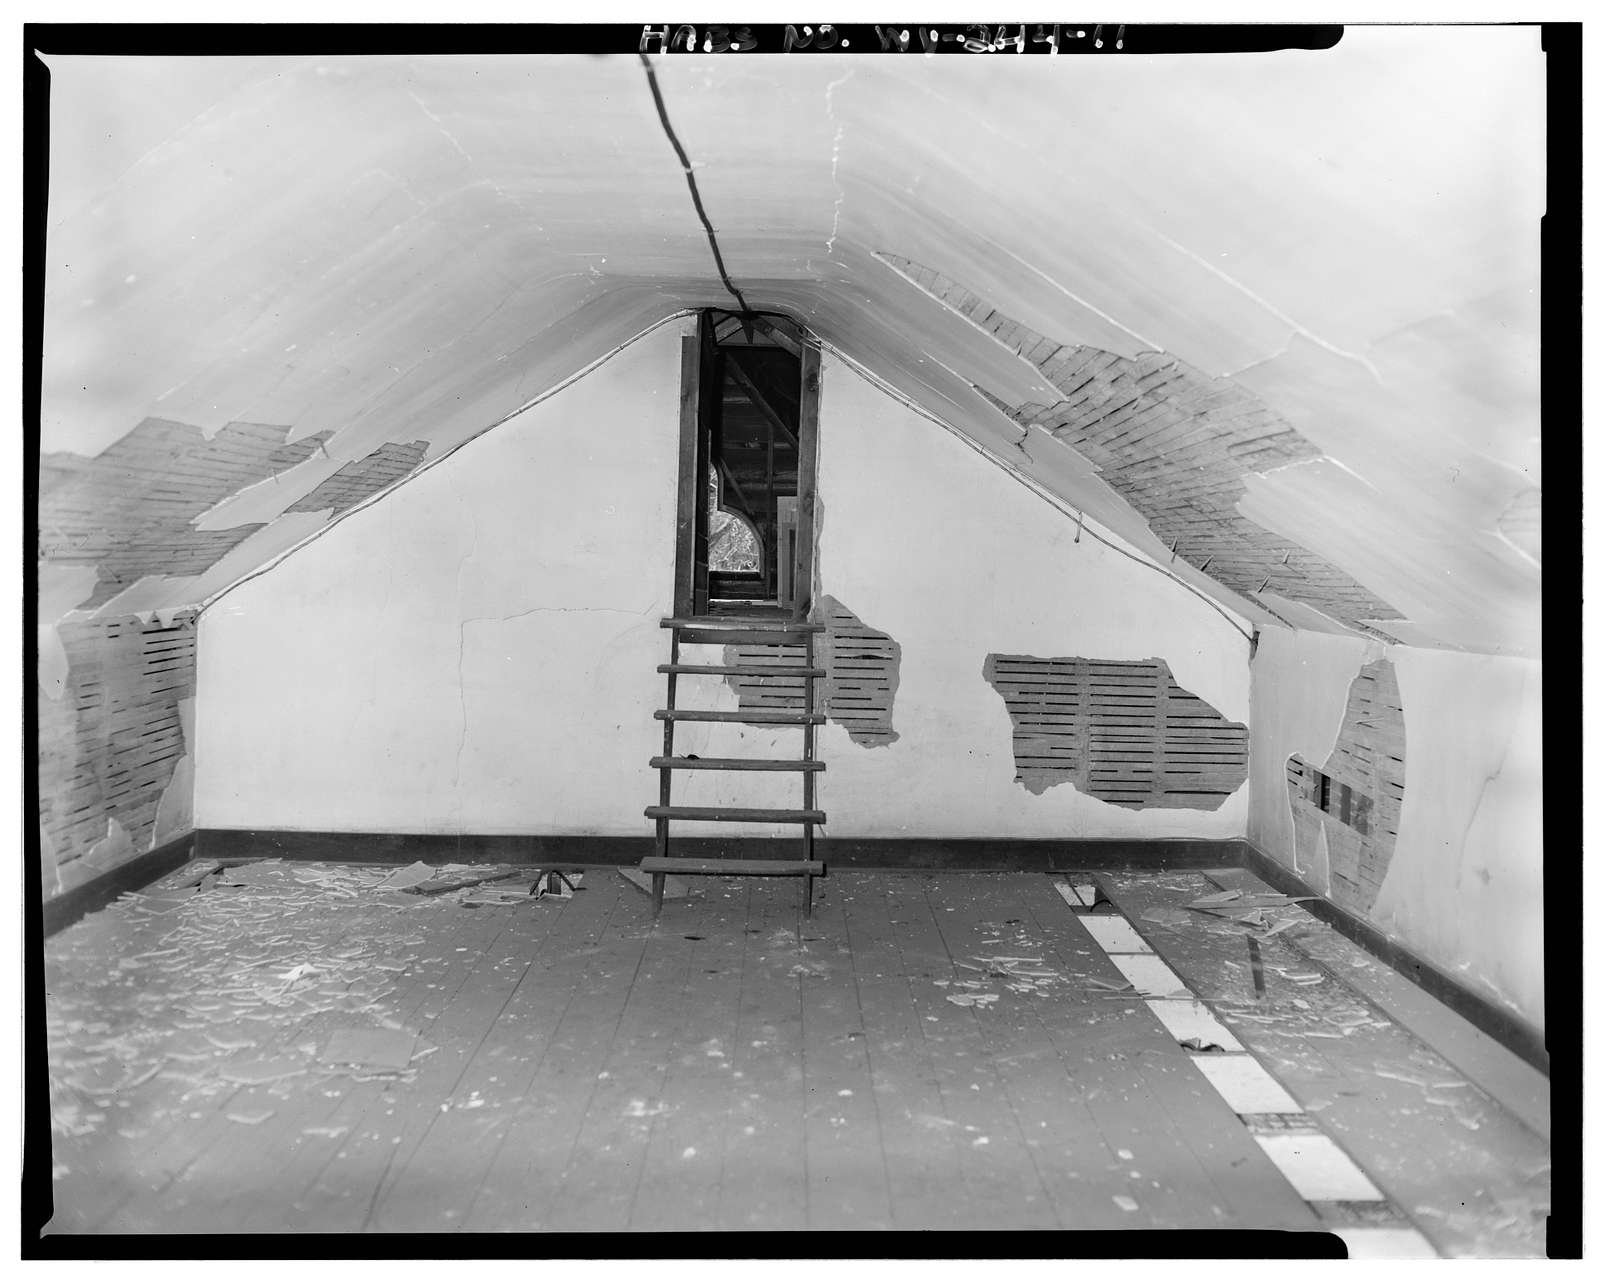 Washington Bottom Farmhouse, Allegany Ballistics Laboratory, Wiley Ford, Mineral County, WV